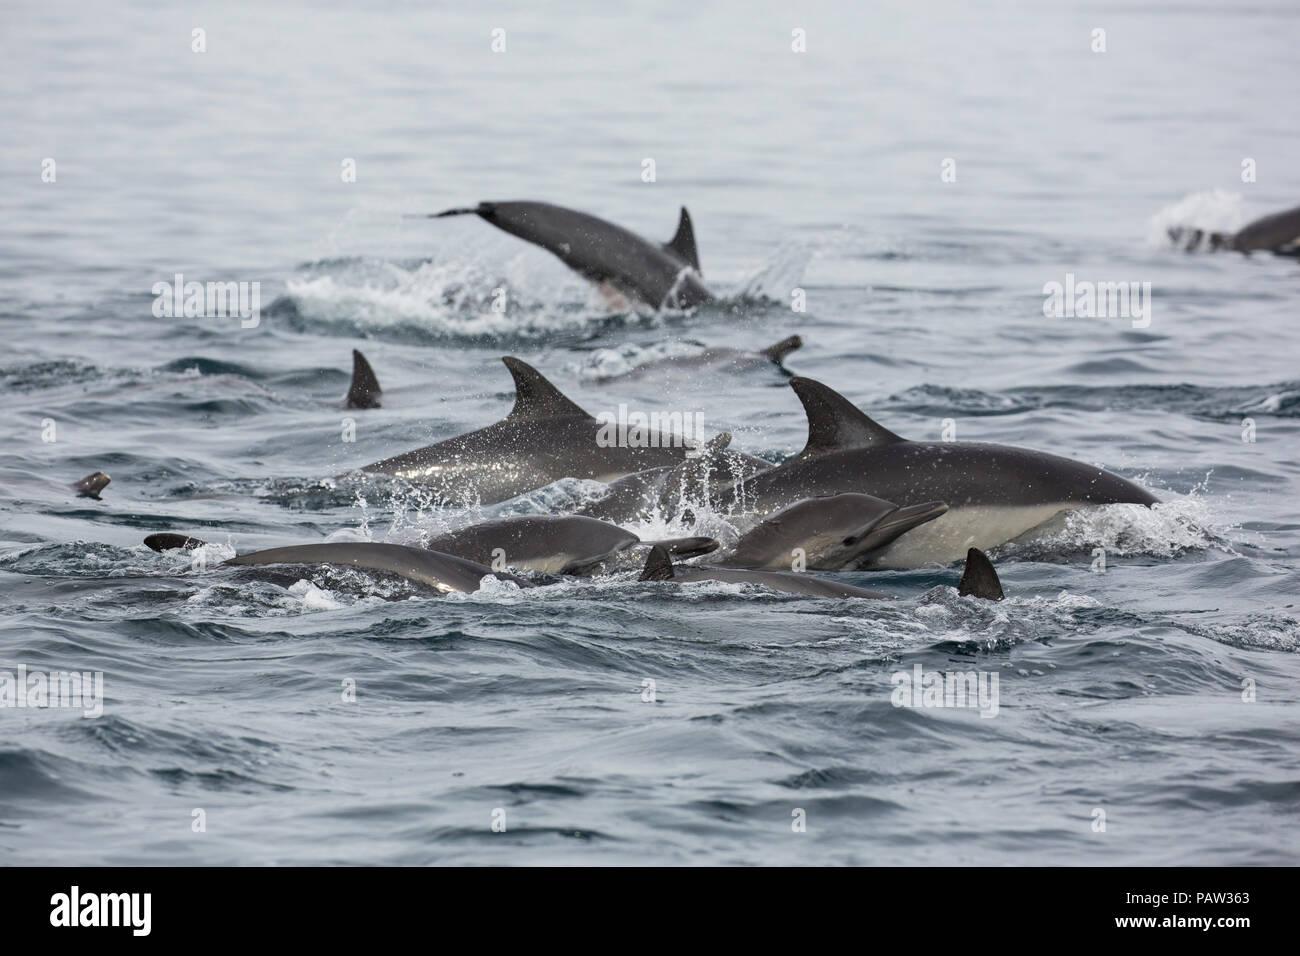 Larga picuda, delfín común Delphinus capensis, Isla San Marcos, Baja California Sur, México. Foto de stock